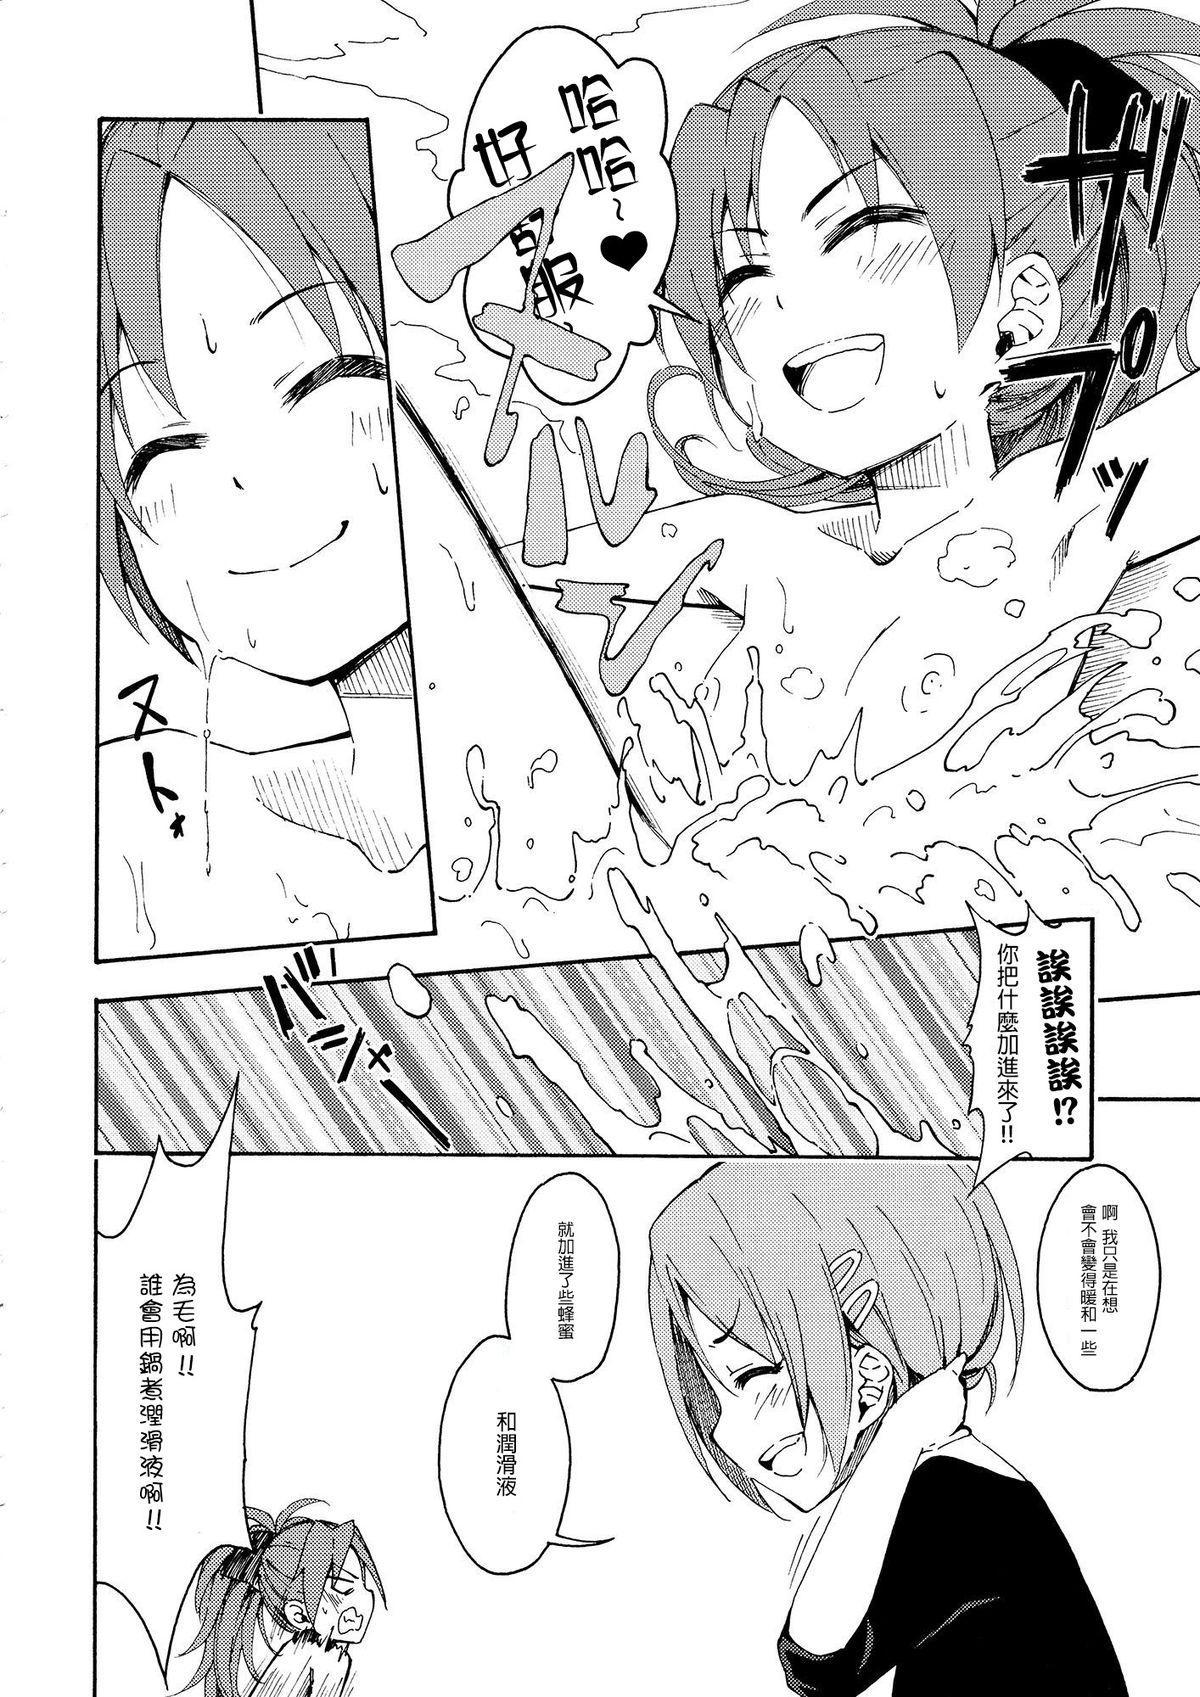 Lovely Girls' Lily Vol. 11 7